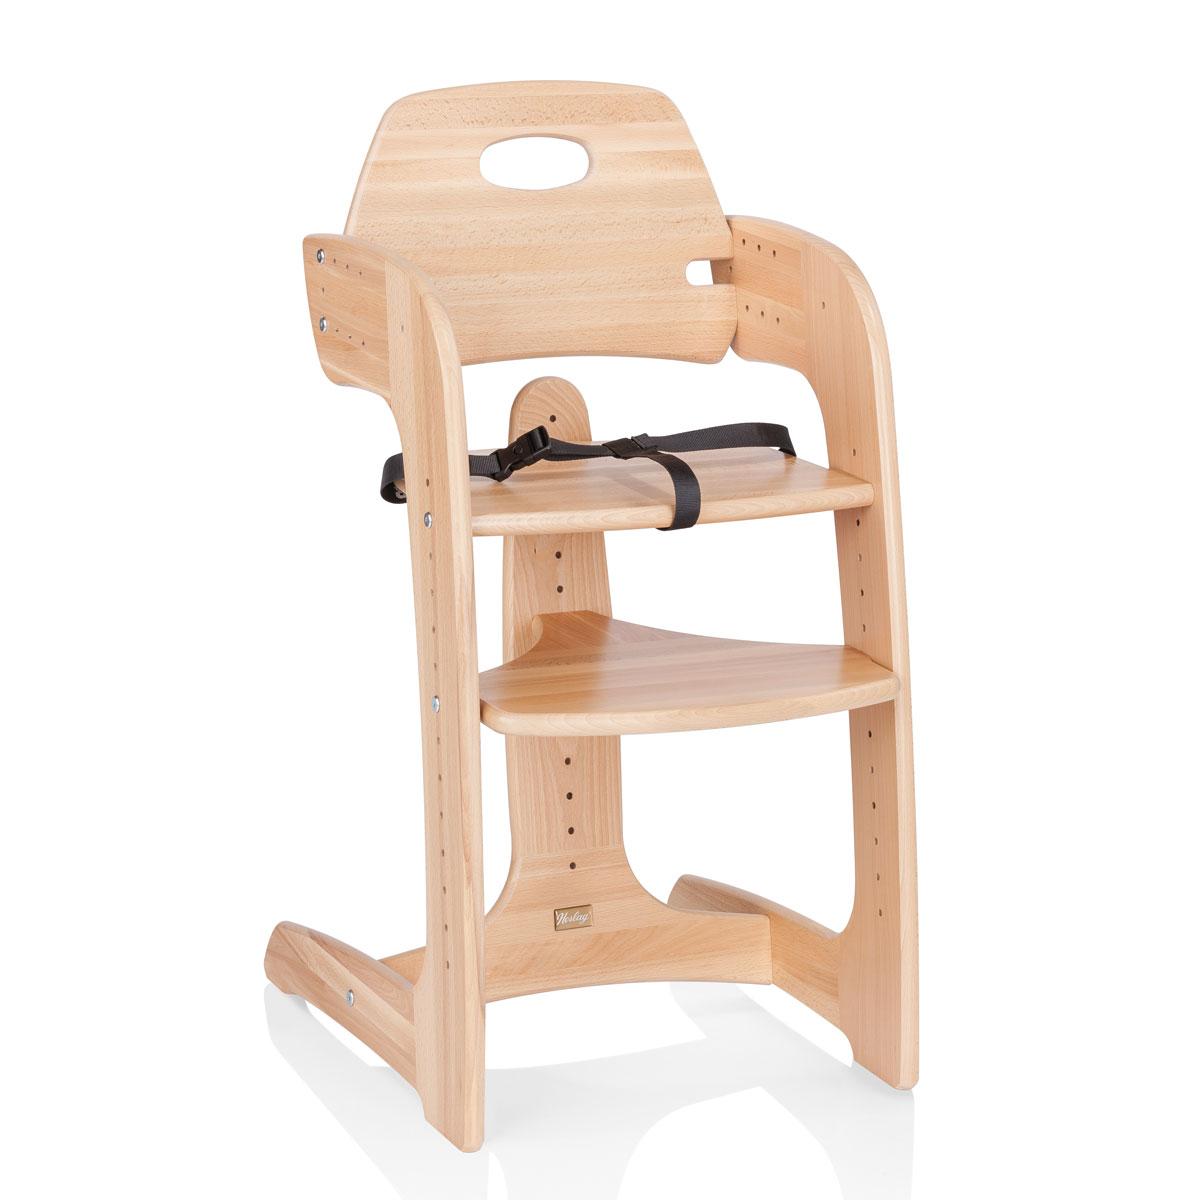 hochstuhl aus holz kiddies24 safety1st timba hochstuhl. Black Bedroom Furniture Sets. Home Design Ideas